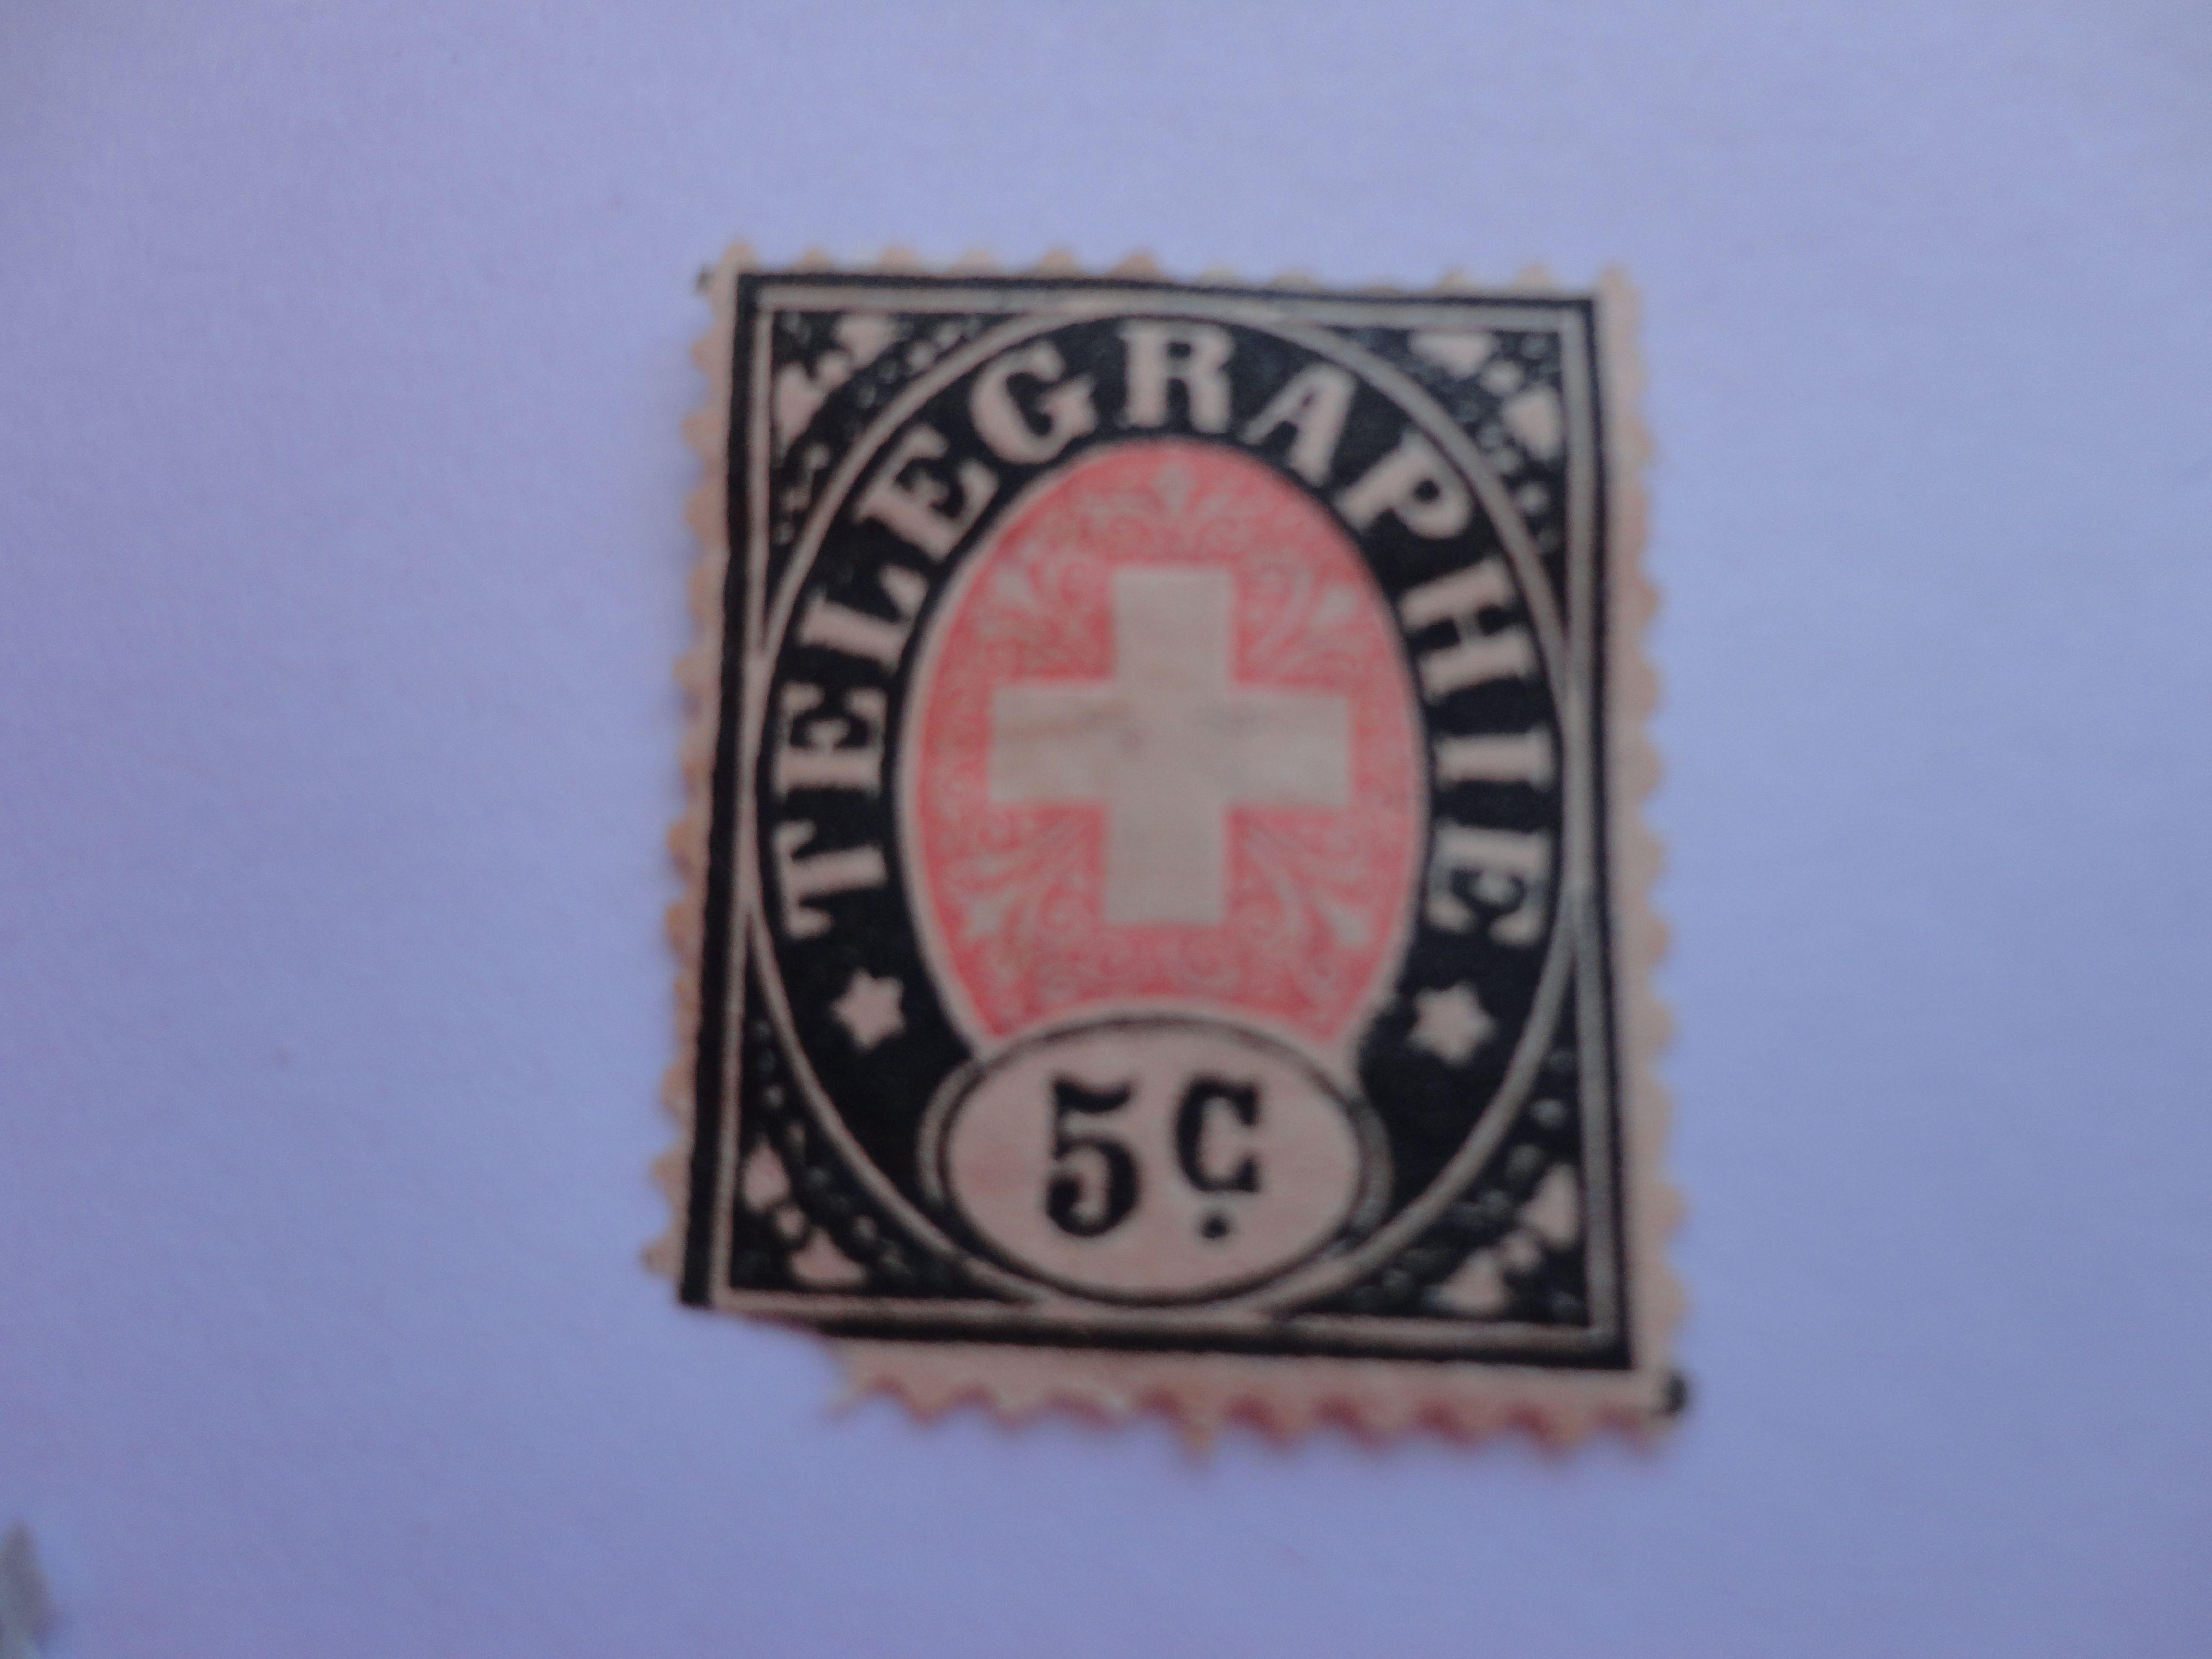 5c. Rare Helvetia Postage Stamp